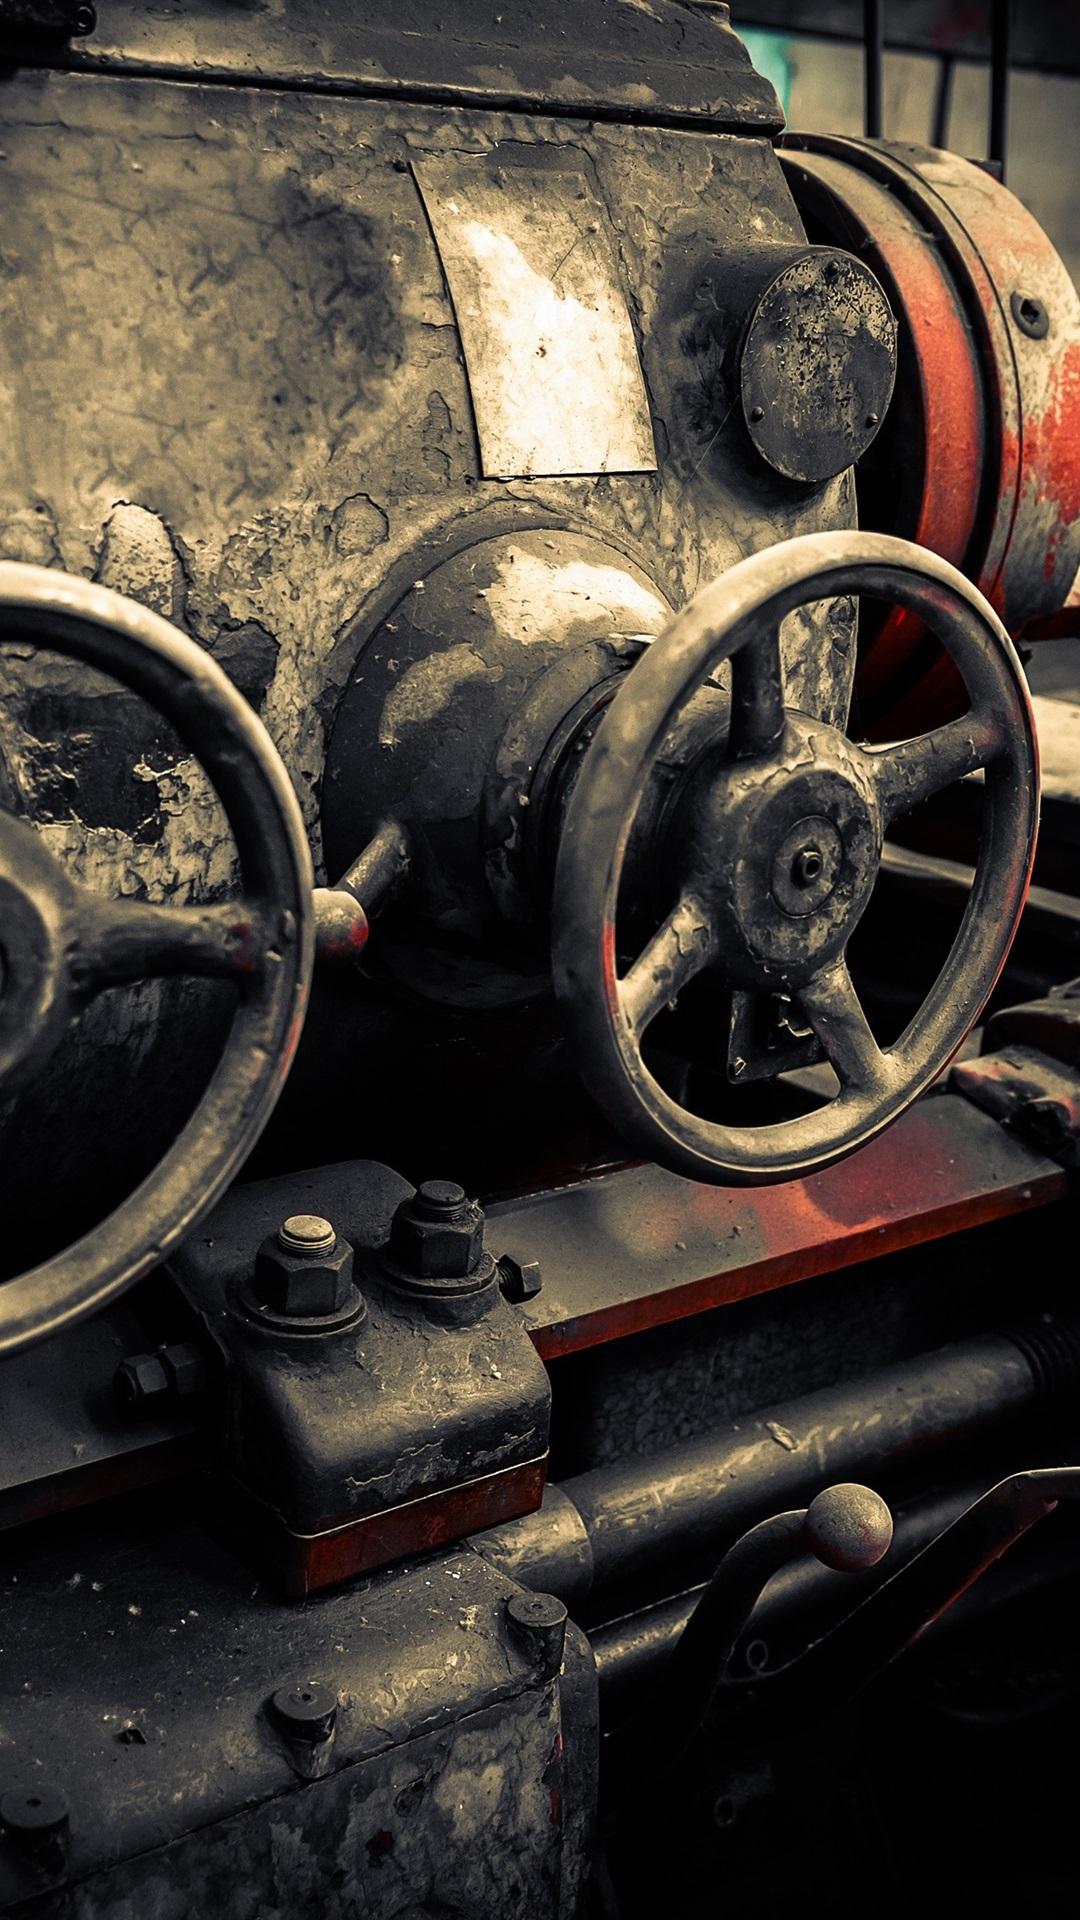 Engine, valves, gears 21x21 iPhone 21/21/21/21S Plus wallpaper ...